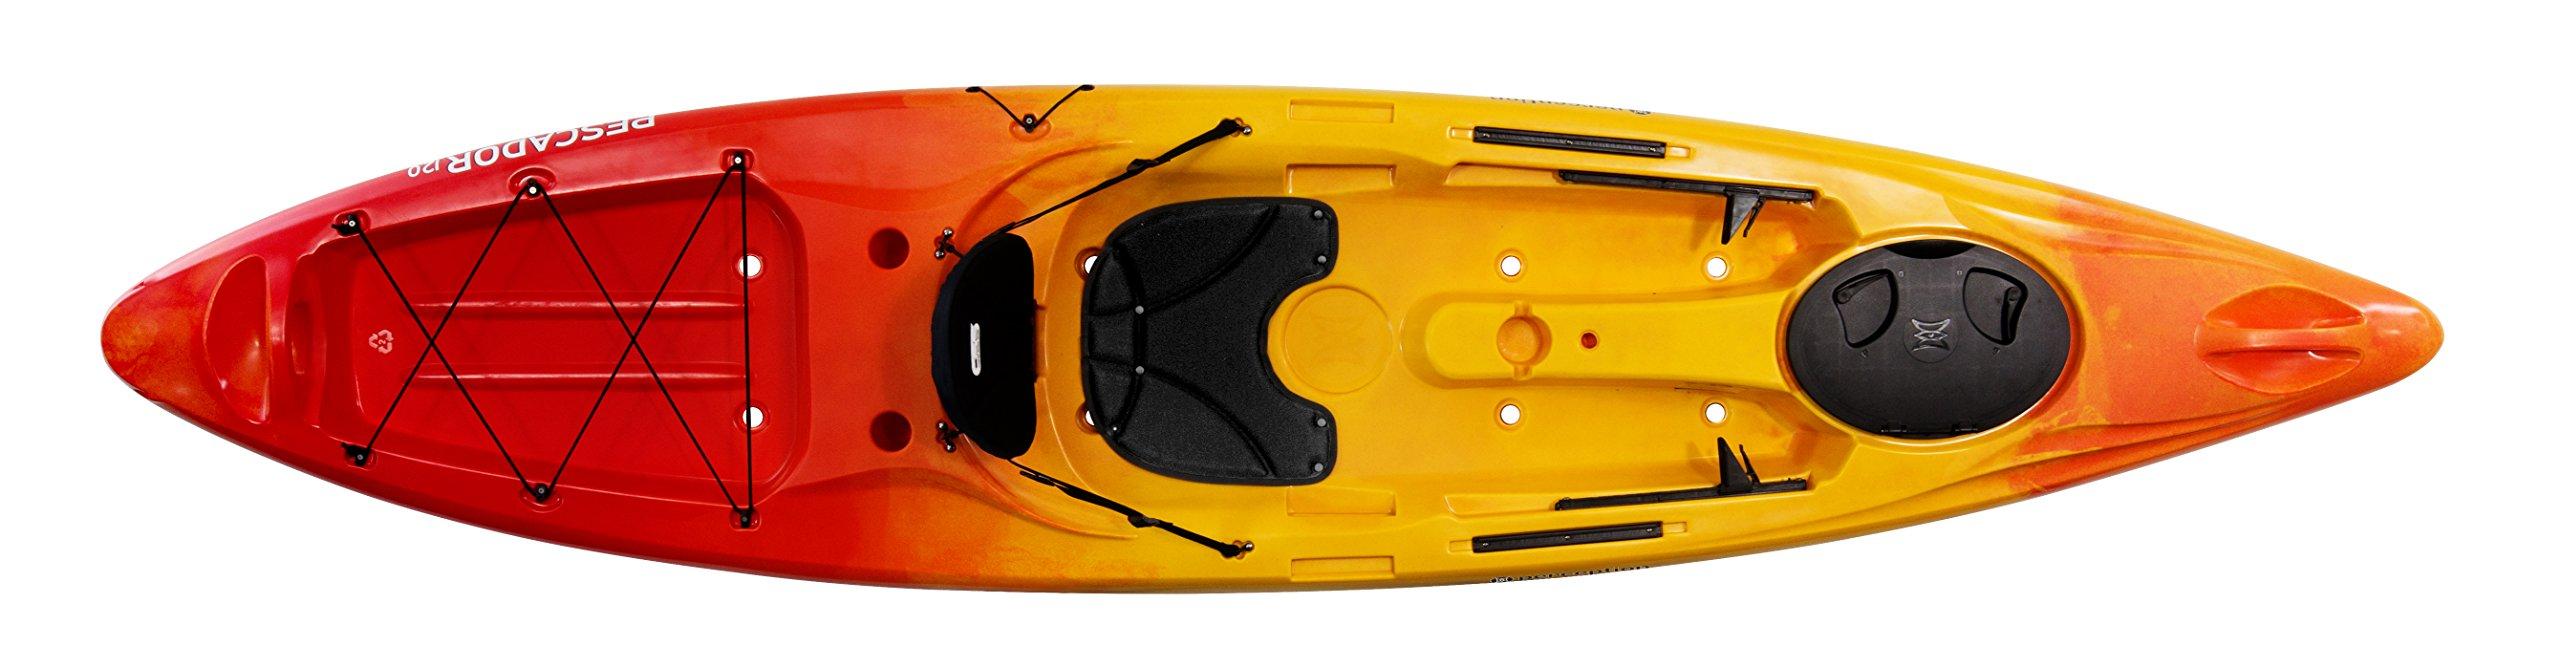 Perception Kayak Pescador 12 Bs, Sunset